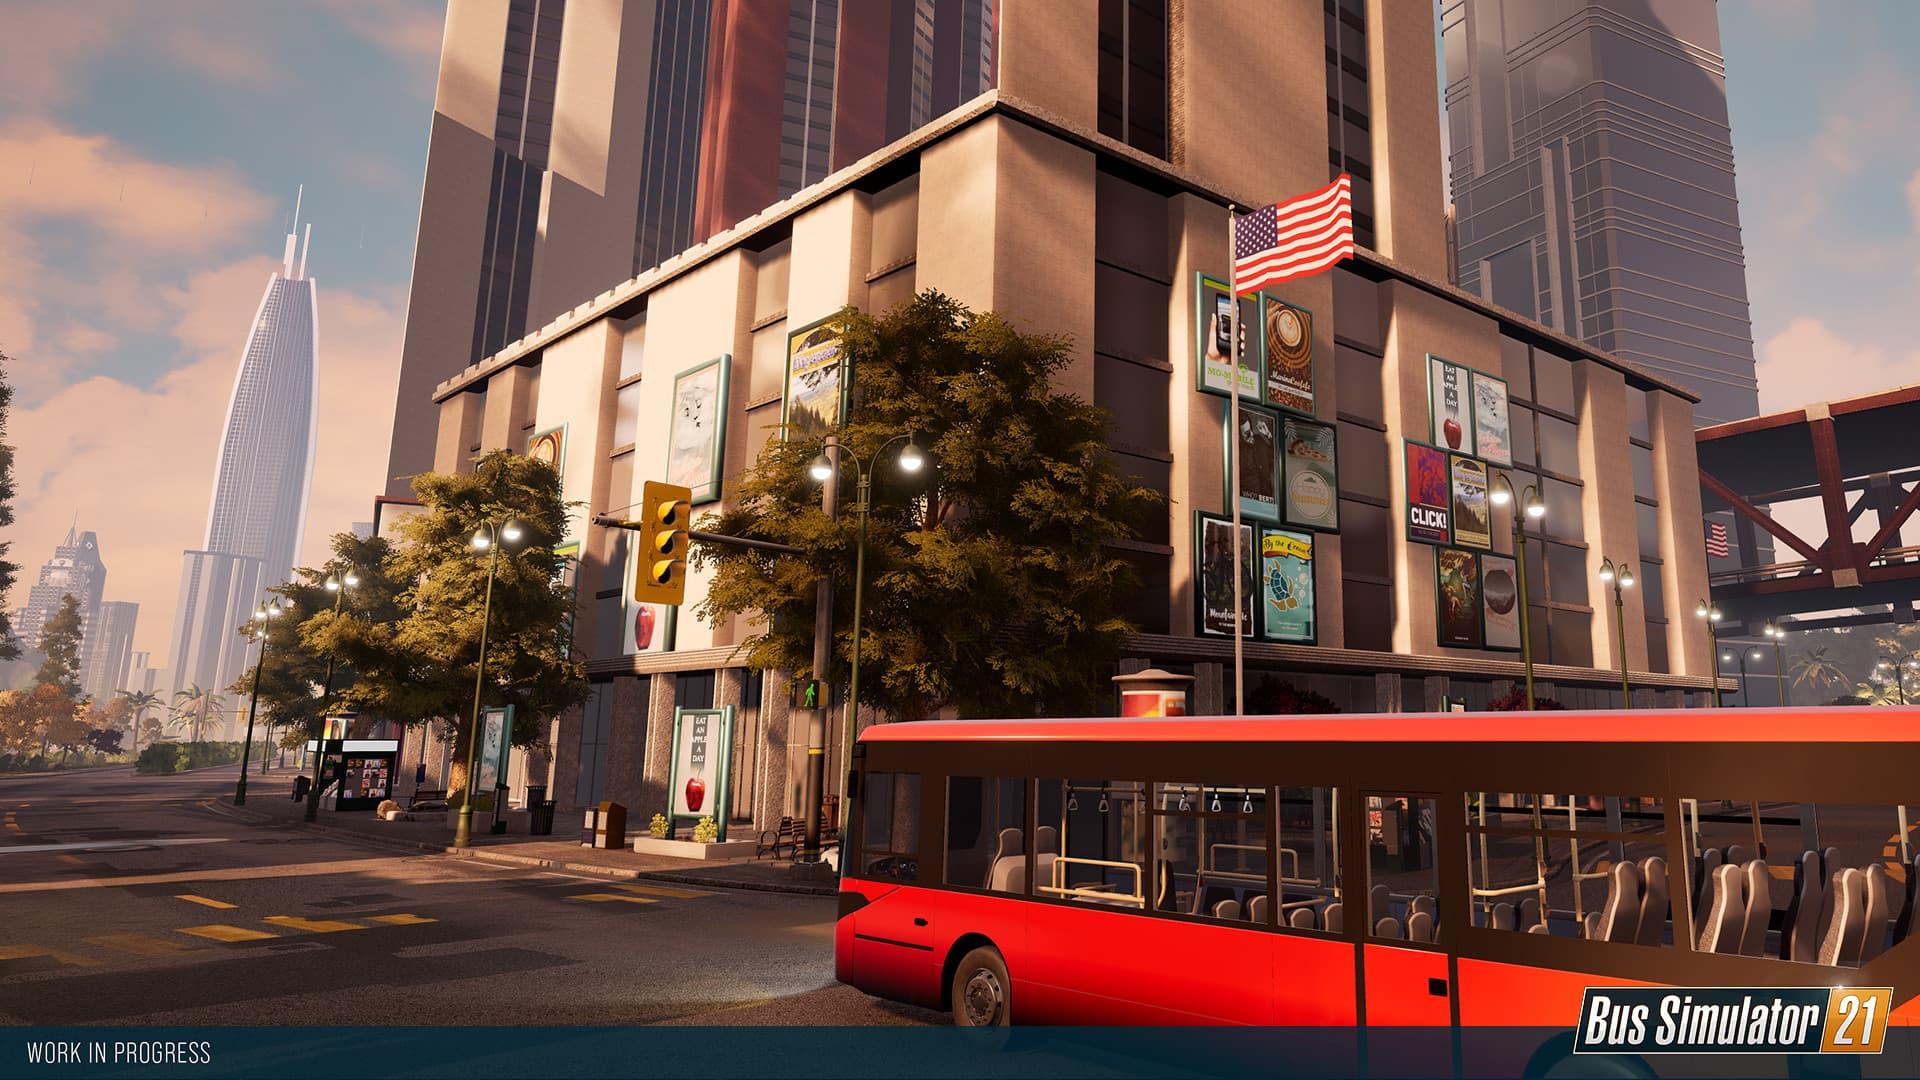 Bus Simulator 21 Xbox One